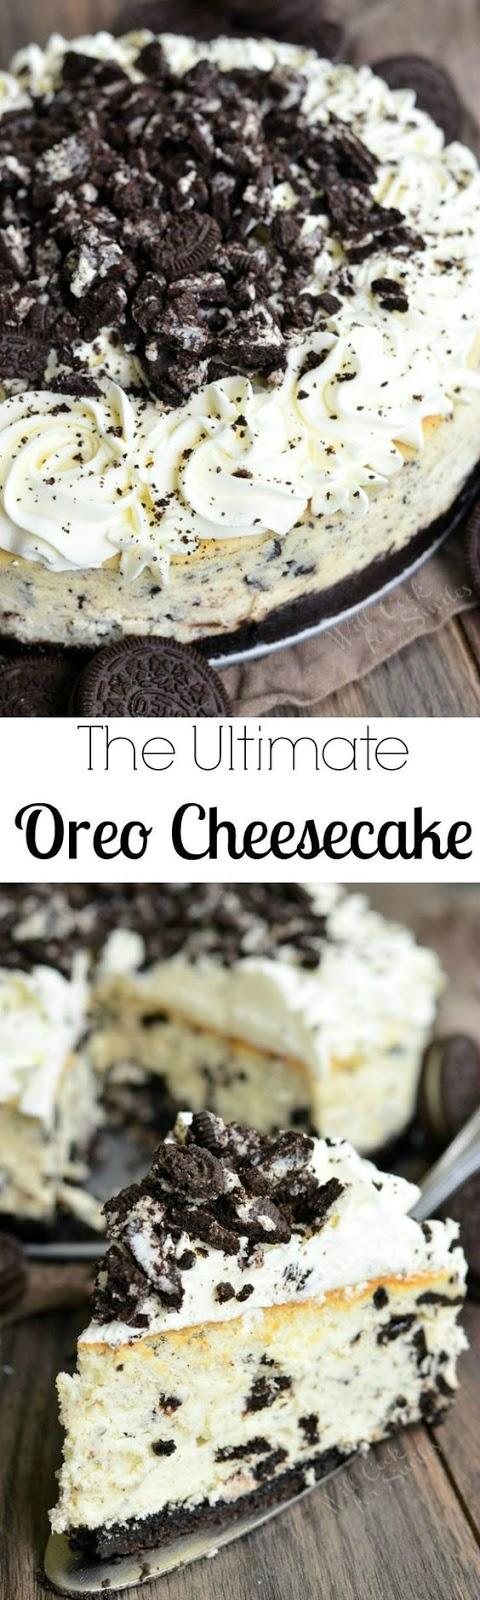 THE ULTIMATE OREO CHEESECAKE